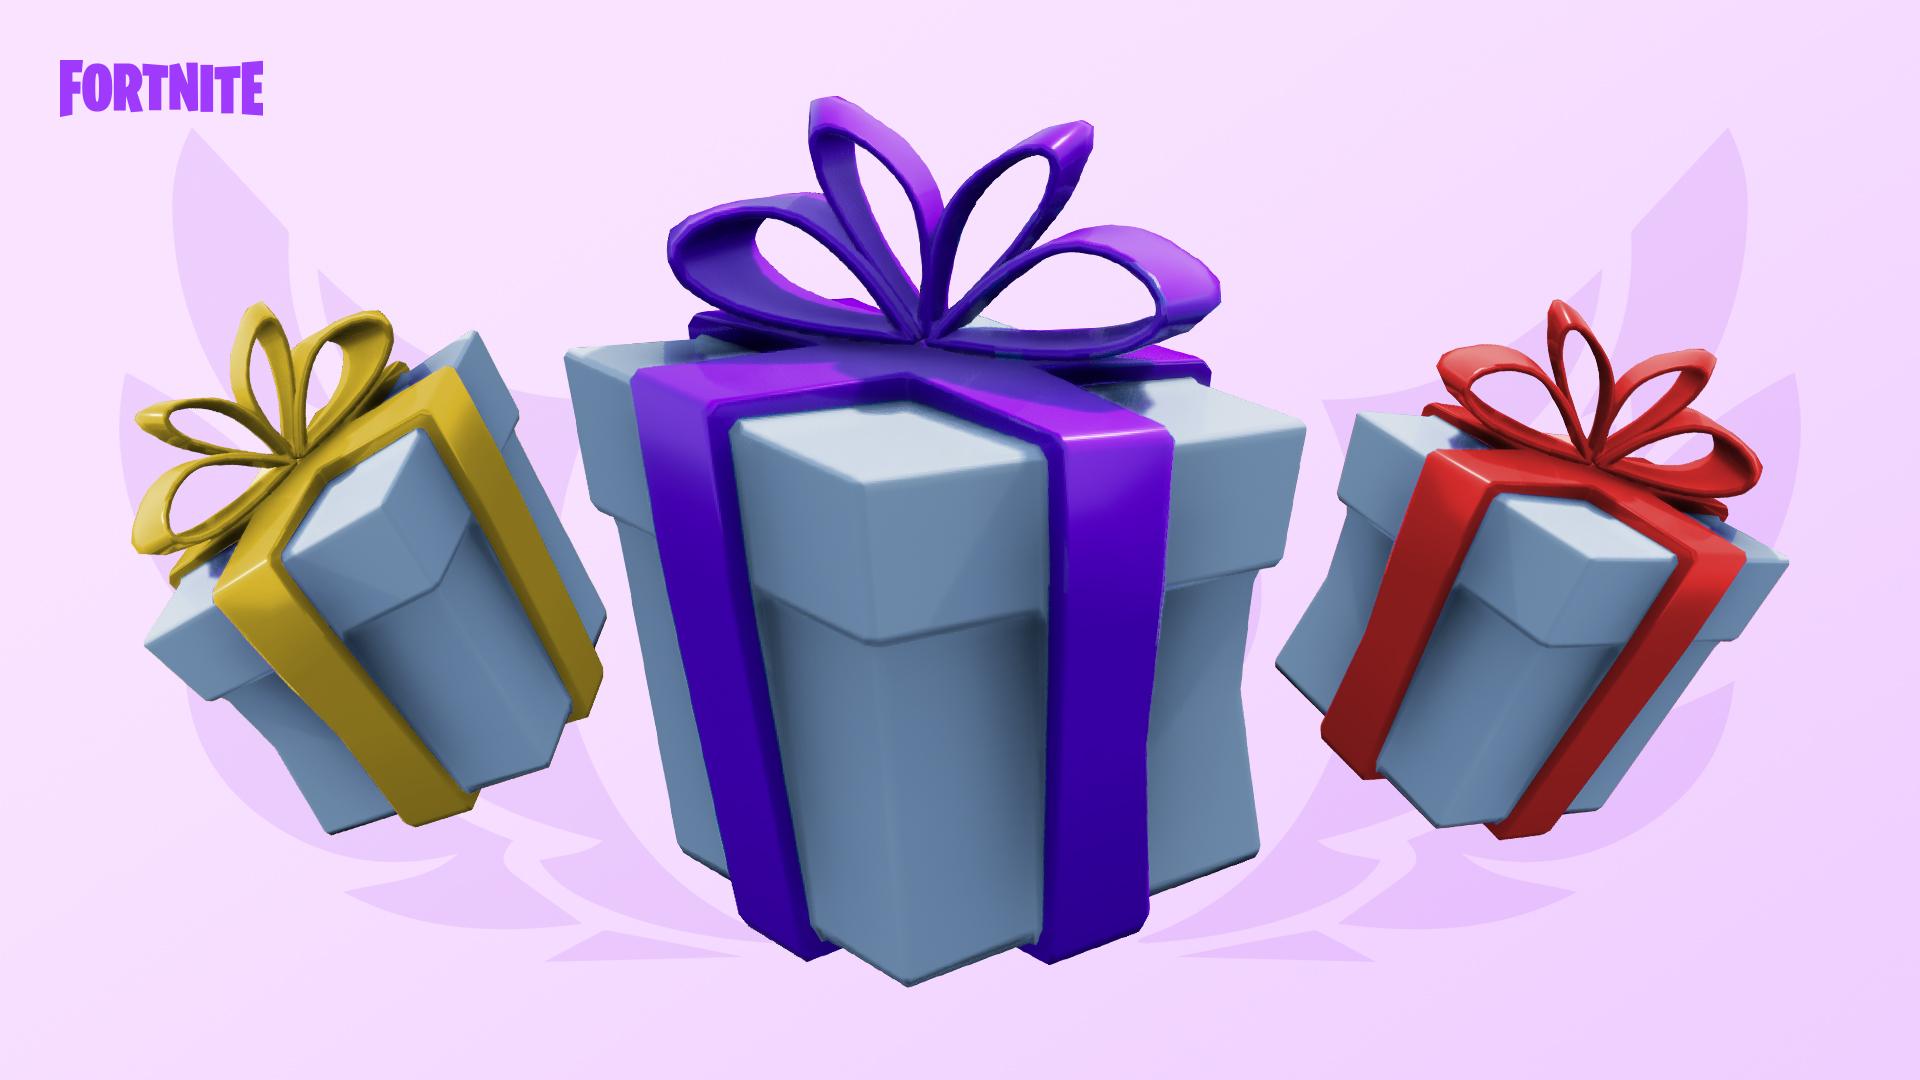 Gifting Purple - Обновления 7.40 для фортнайт